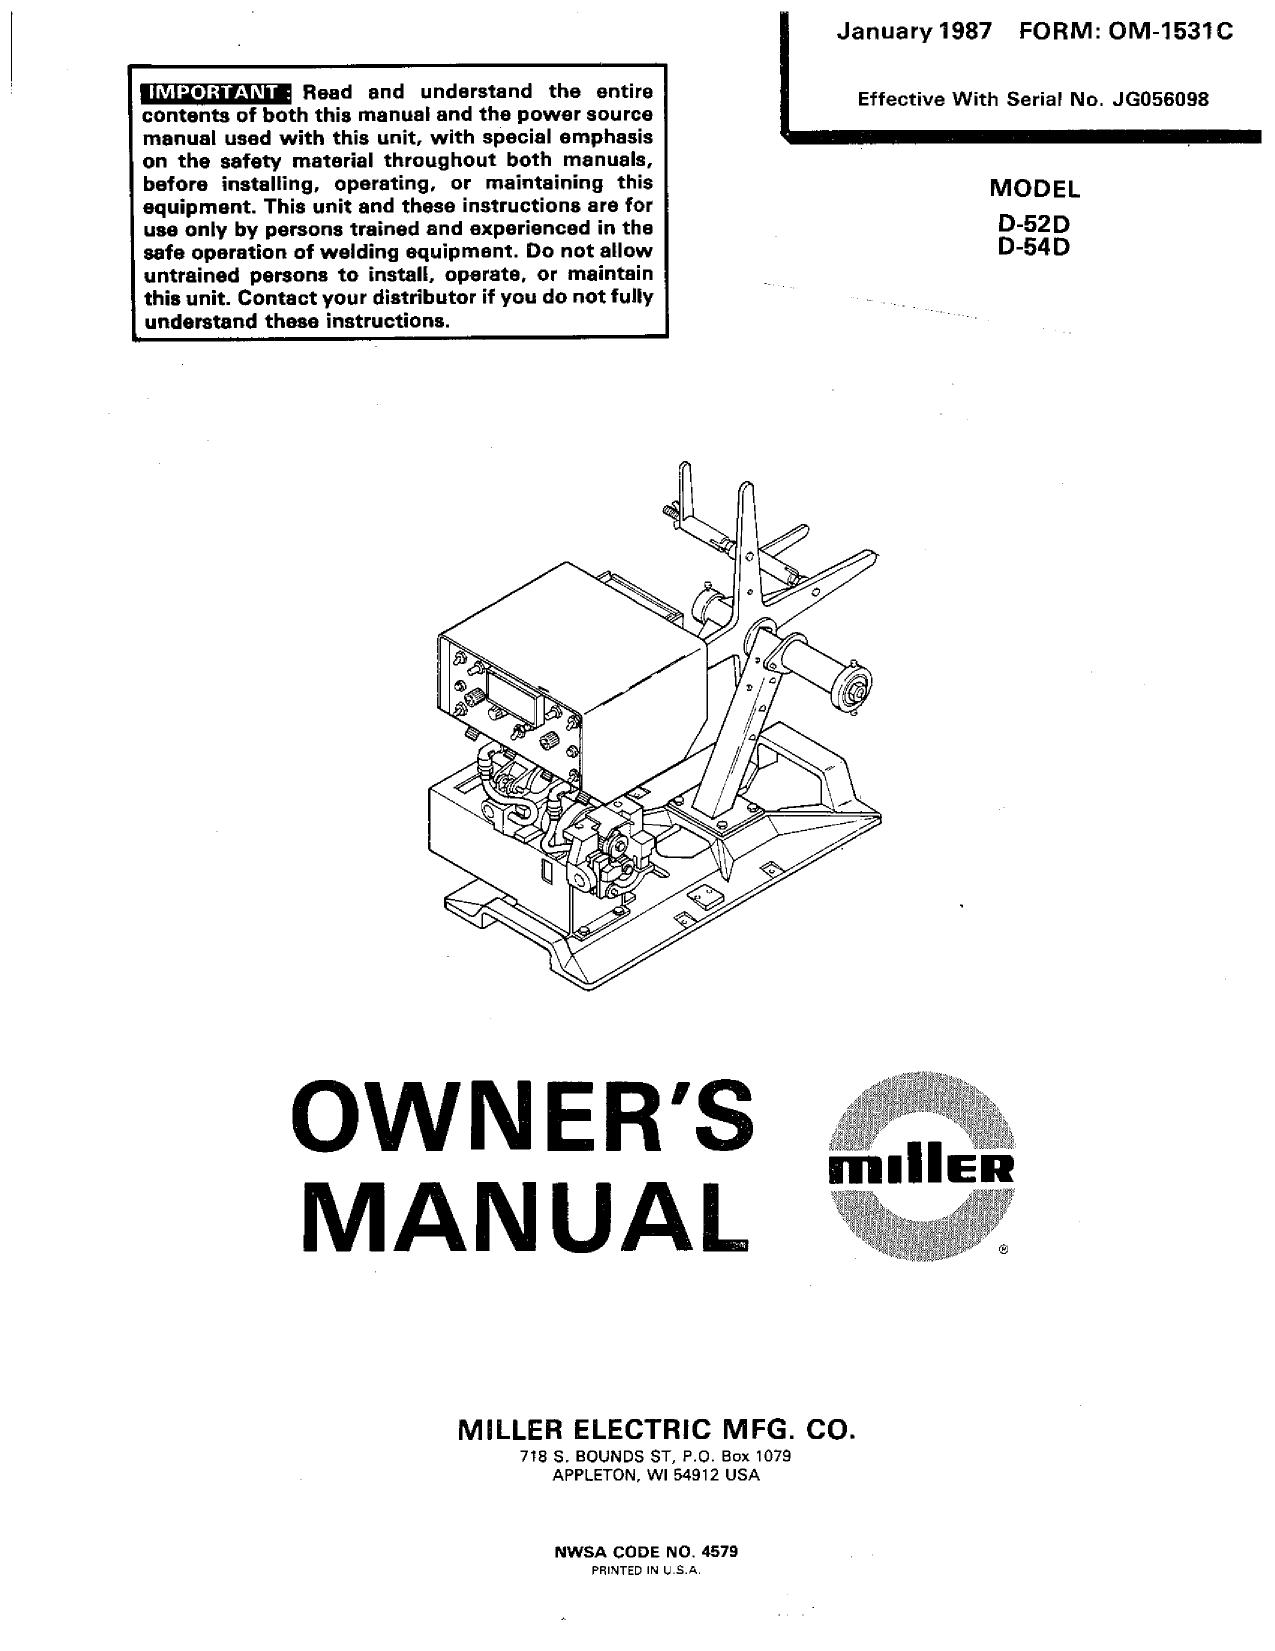 Miller JG40 Owner's manual   Manualzz